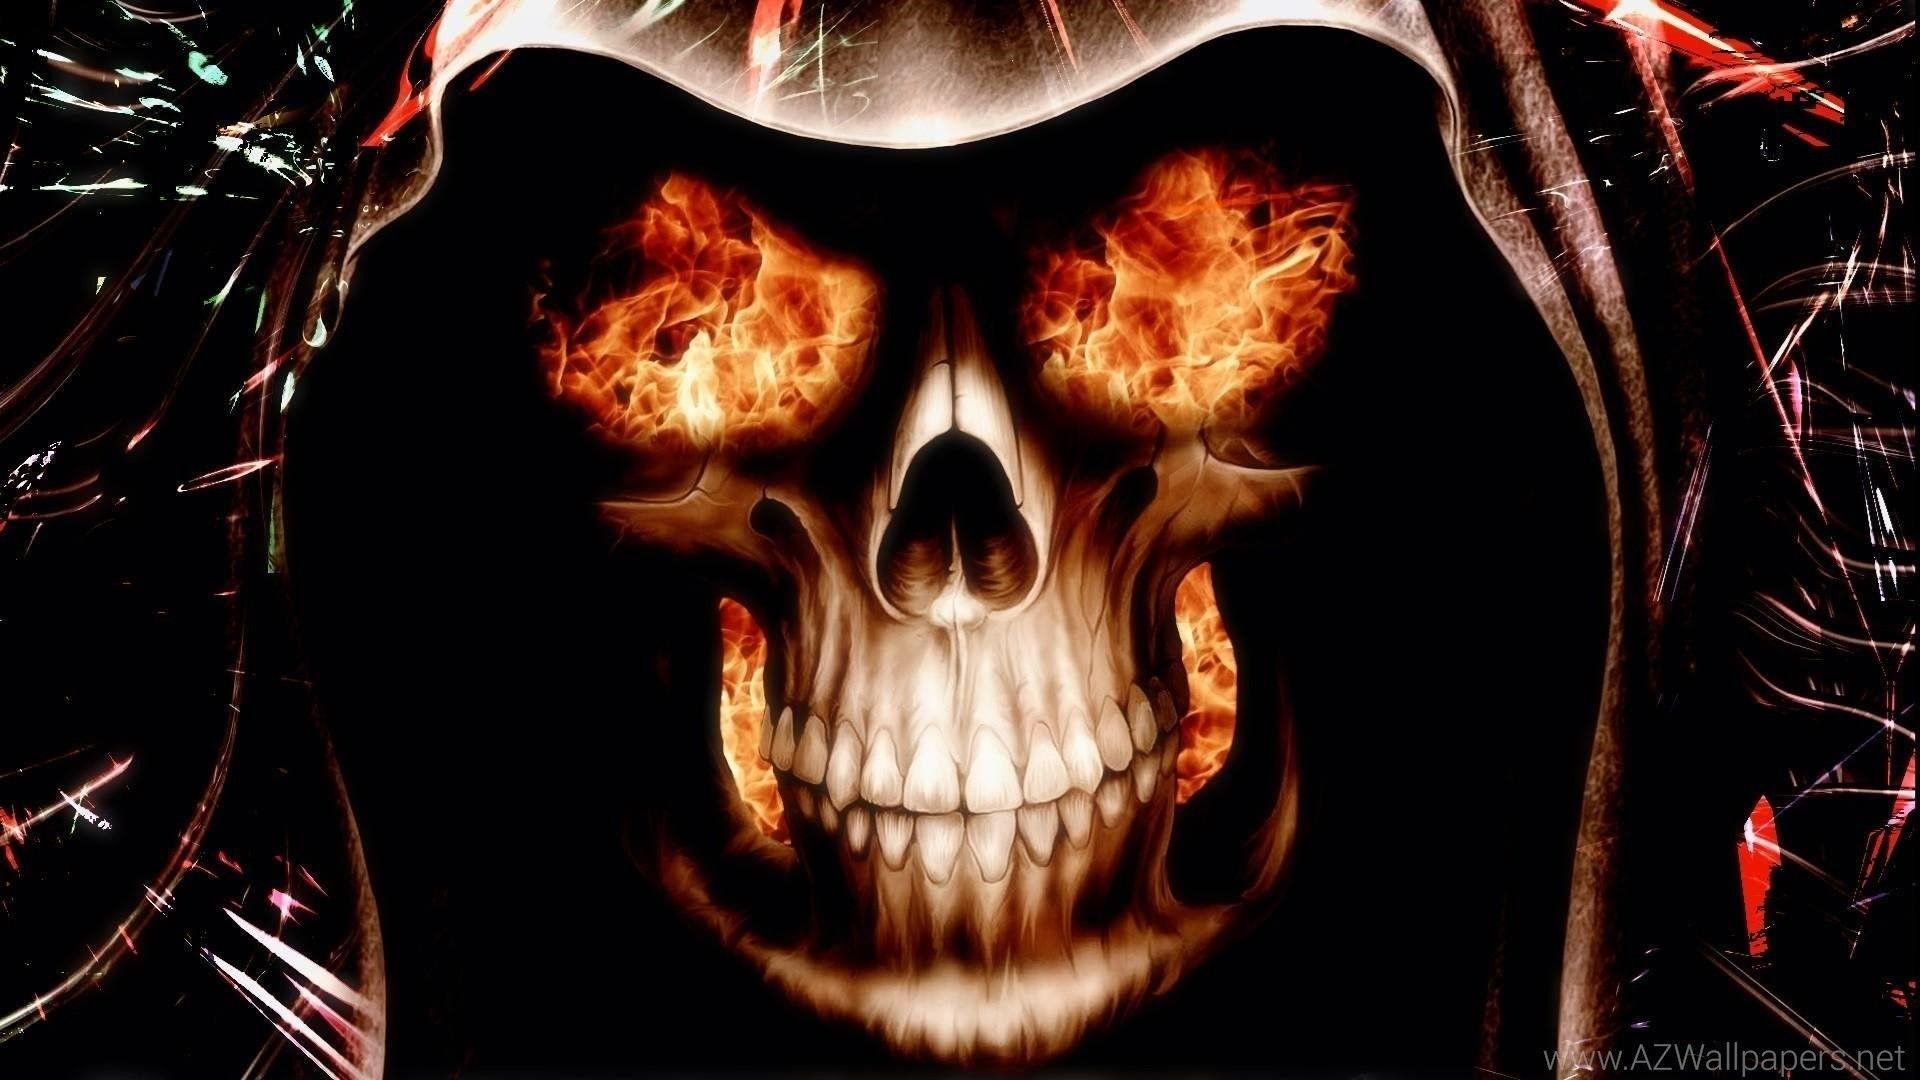 HD Skull Desktop Wallpapers